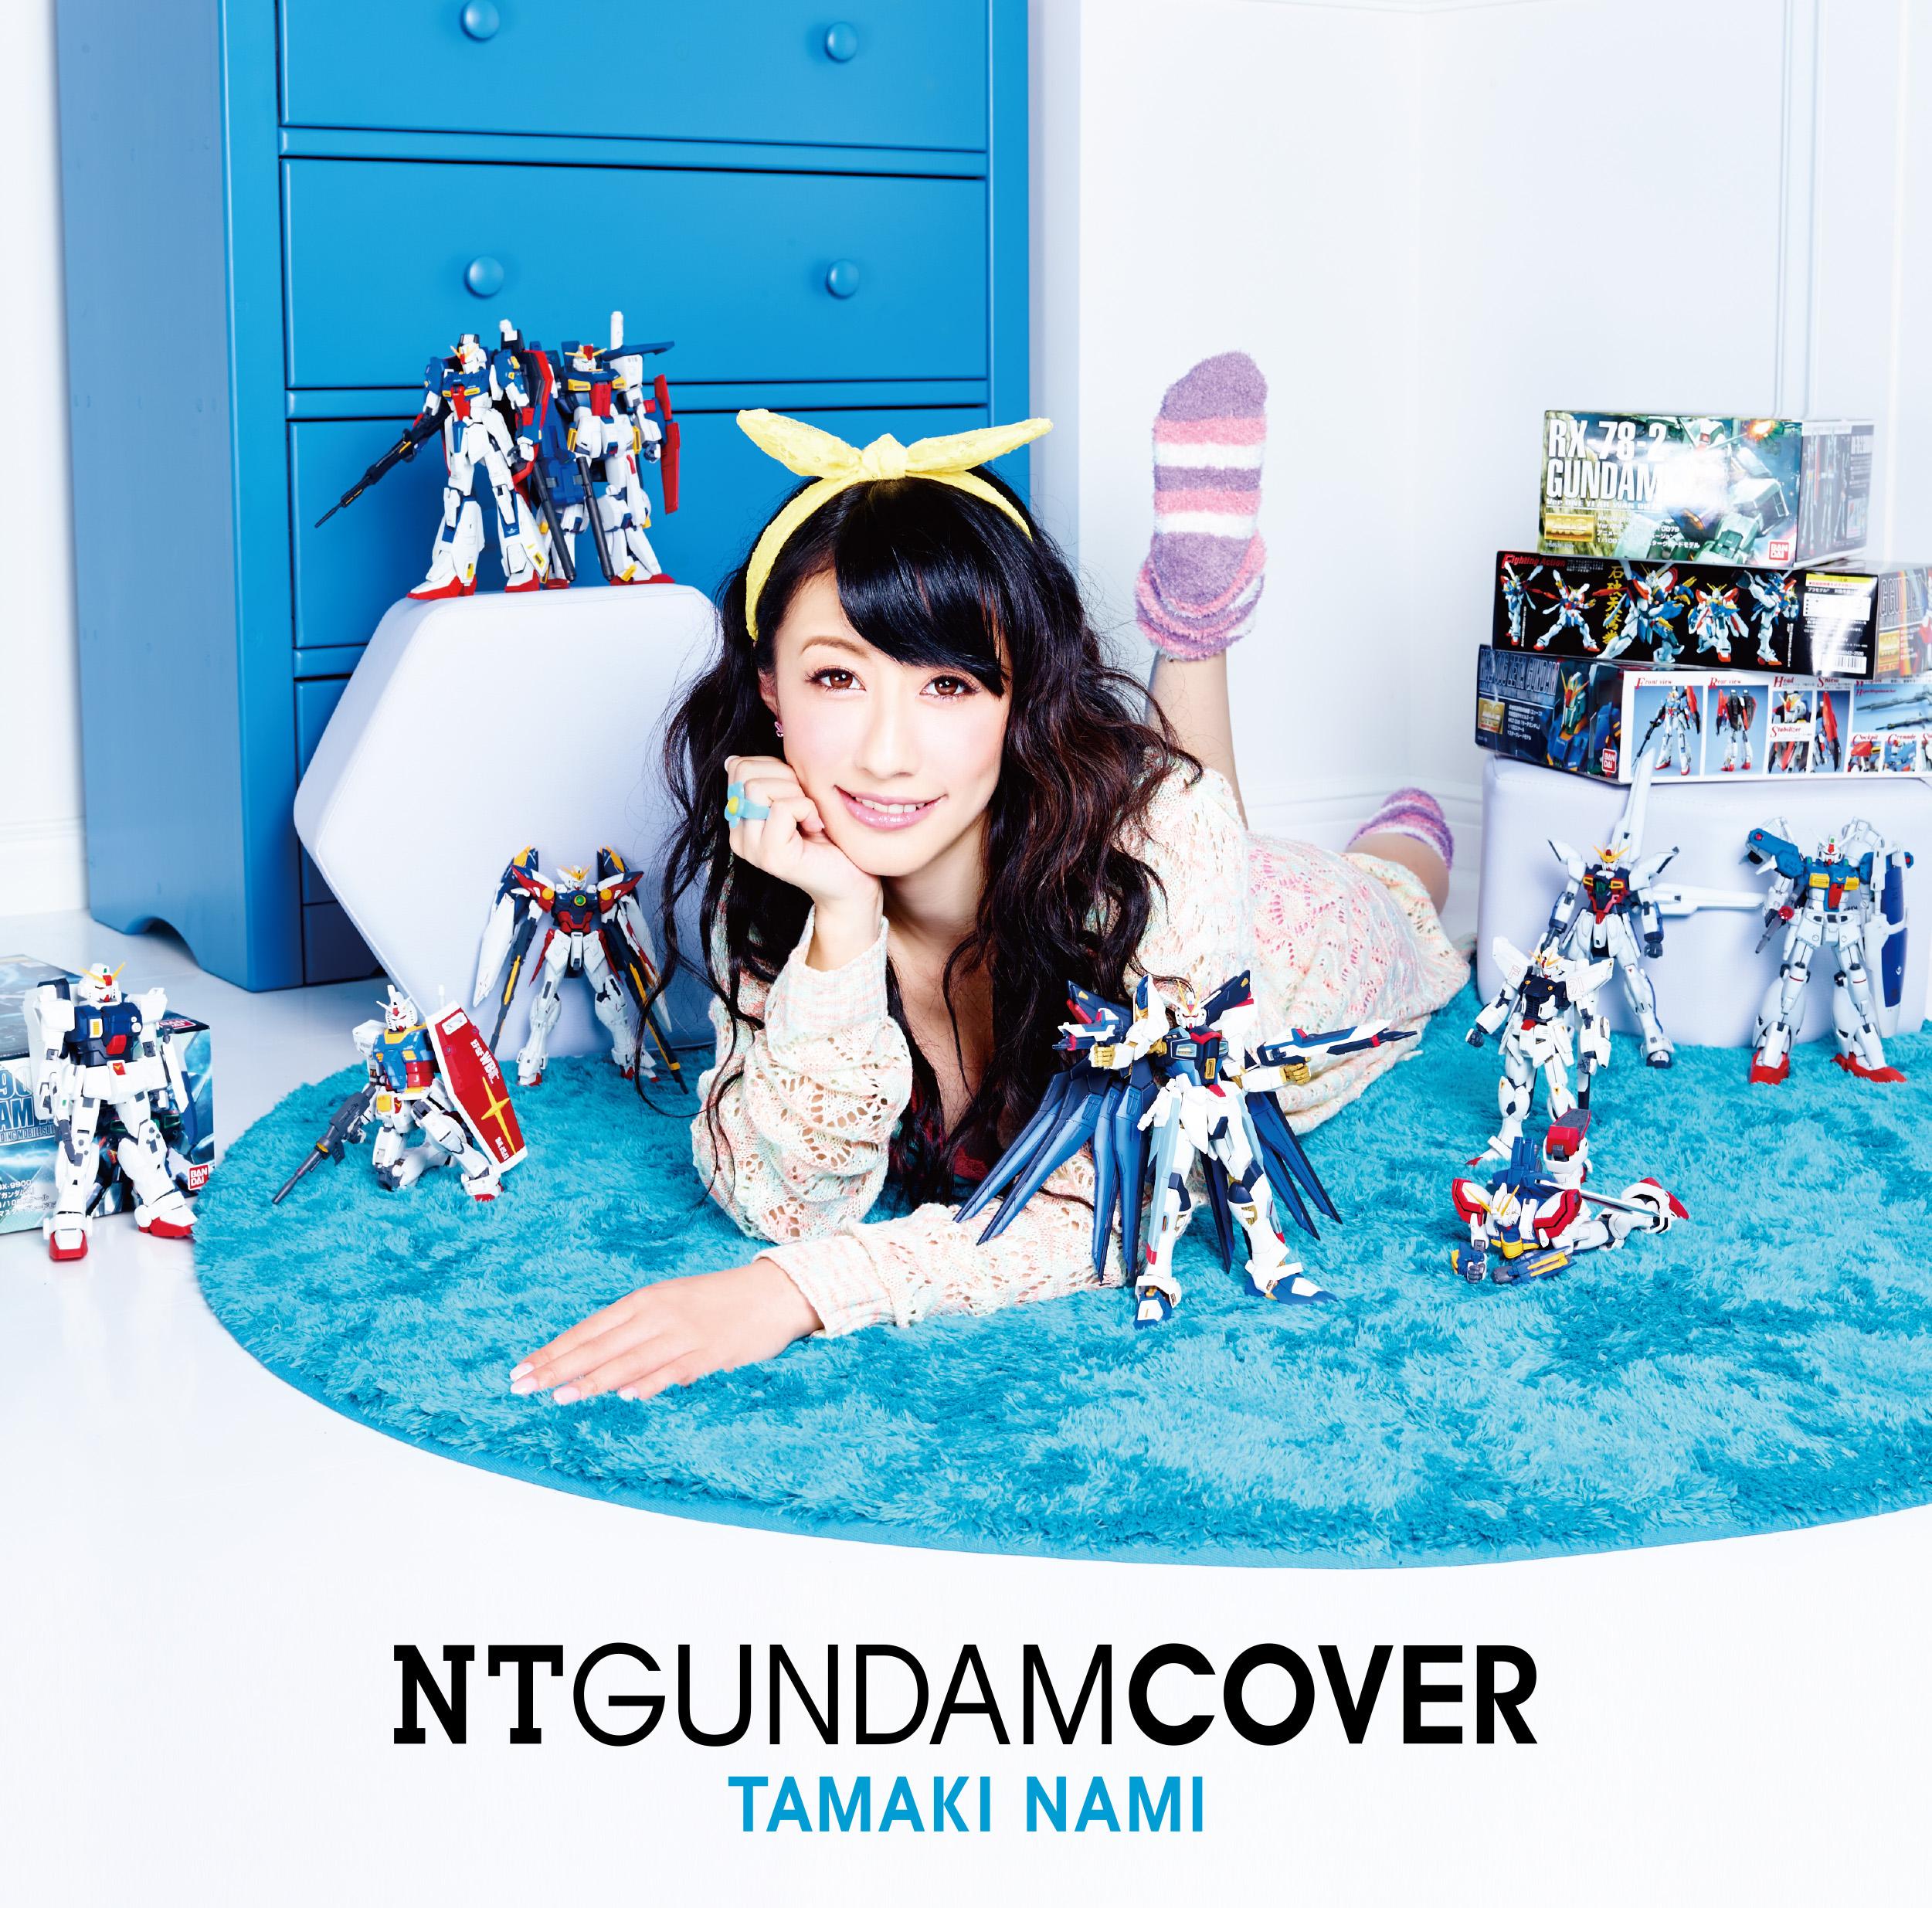 20170502.1511.05 Nami Tamaki - NT Gundam Cover cover.jpg